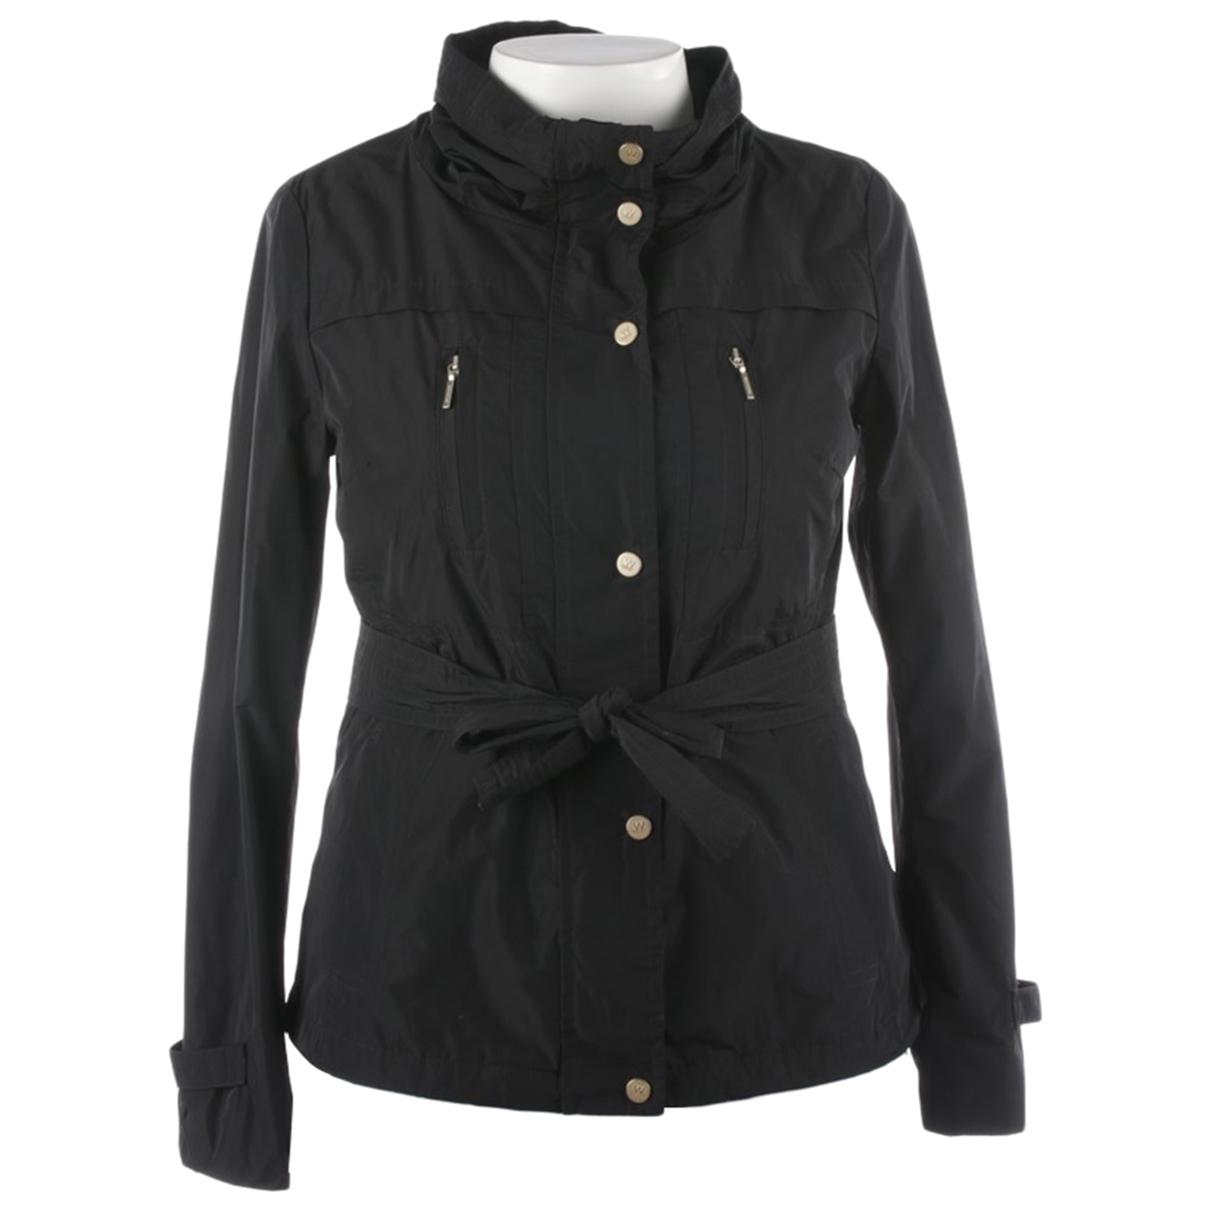 Max Mara N Black jacket for Women 40 IT